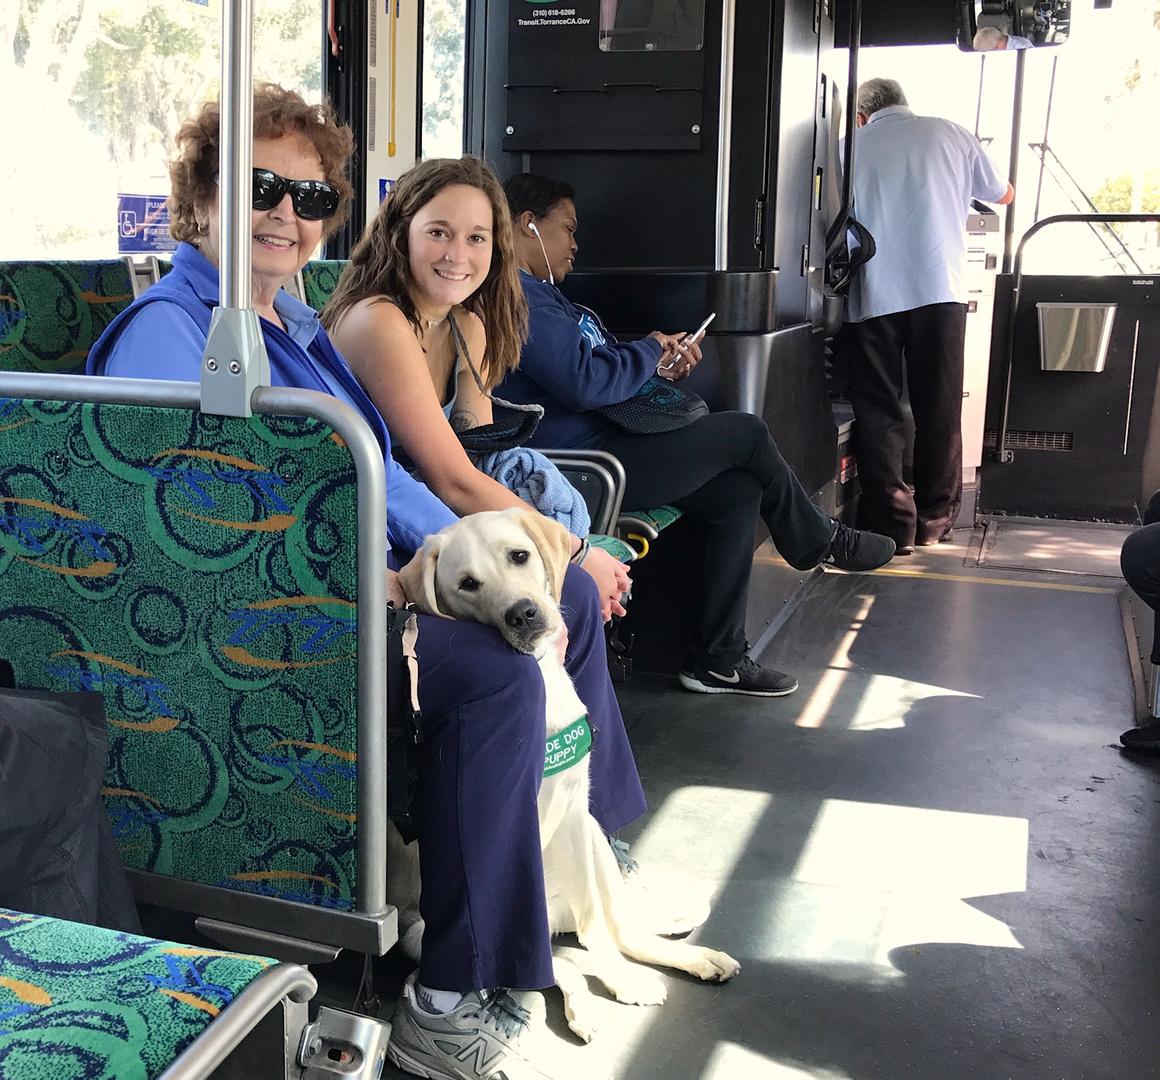 Training: Bus Ride, 20170516